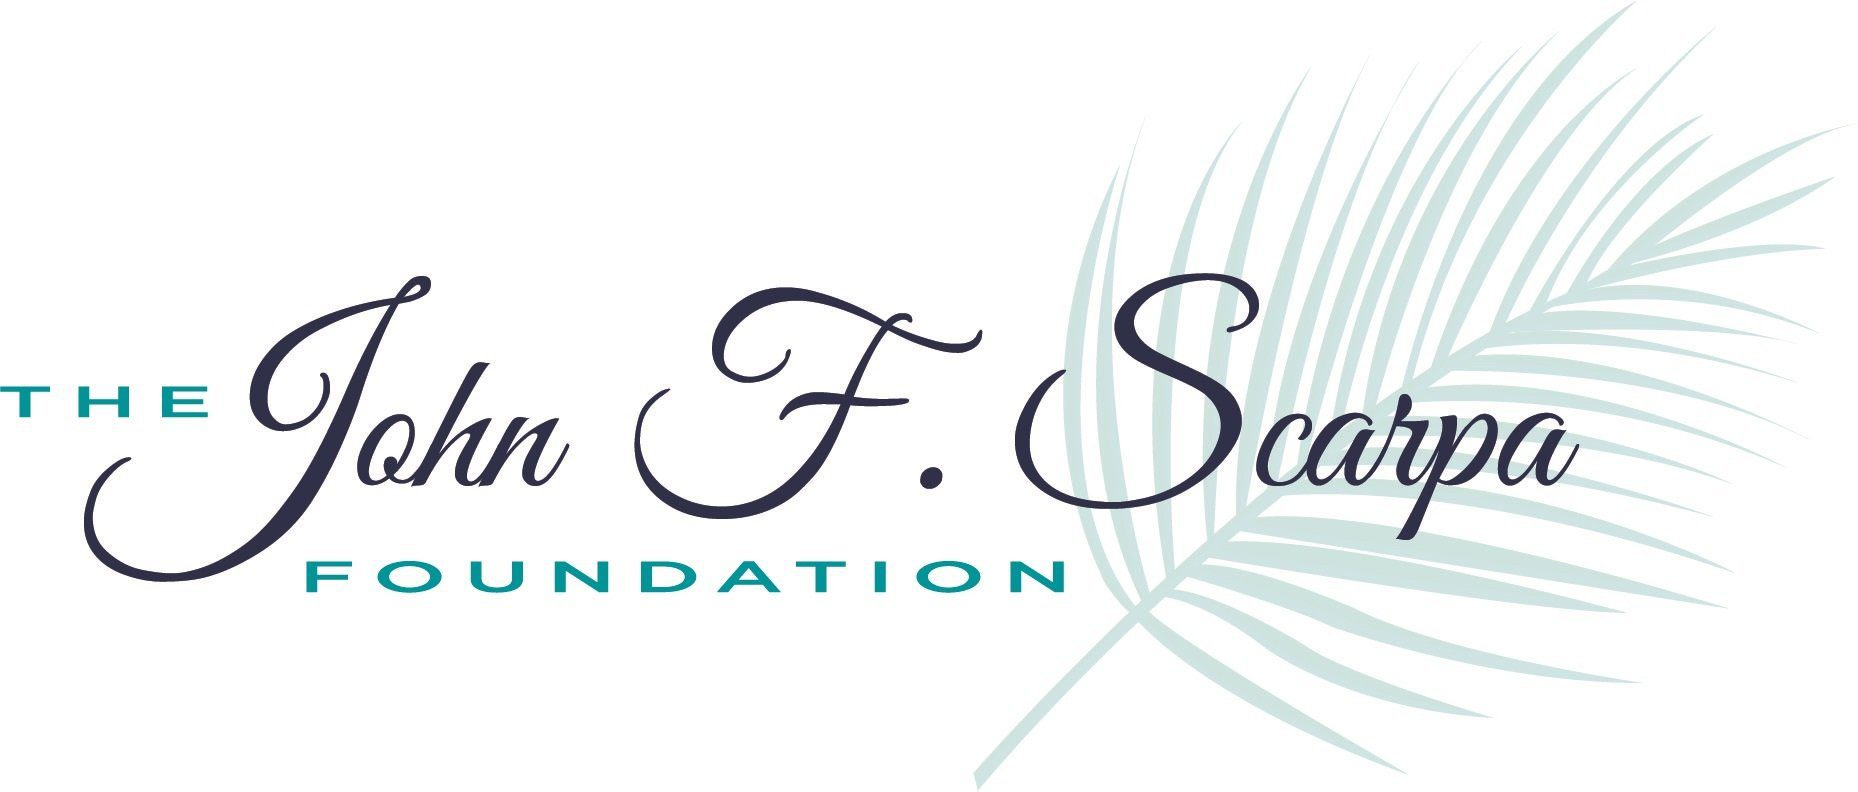 John+F.+Scarpa+Foundation